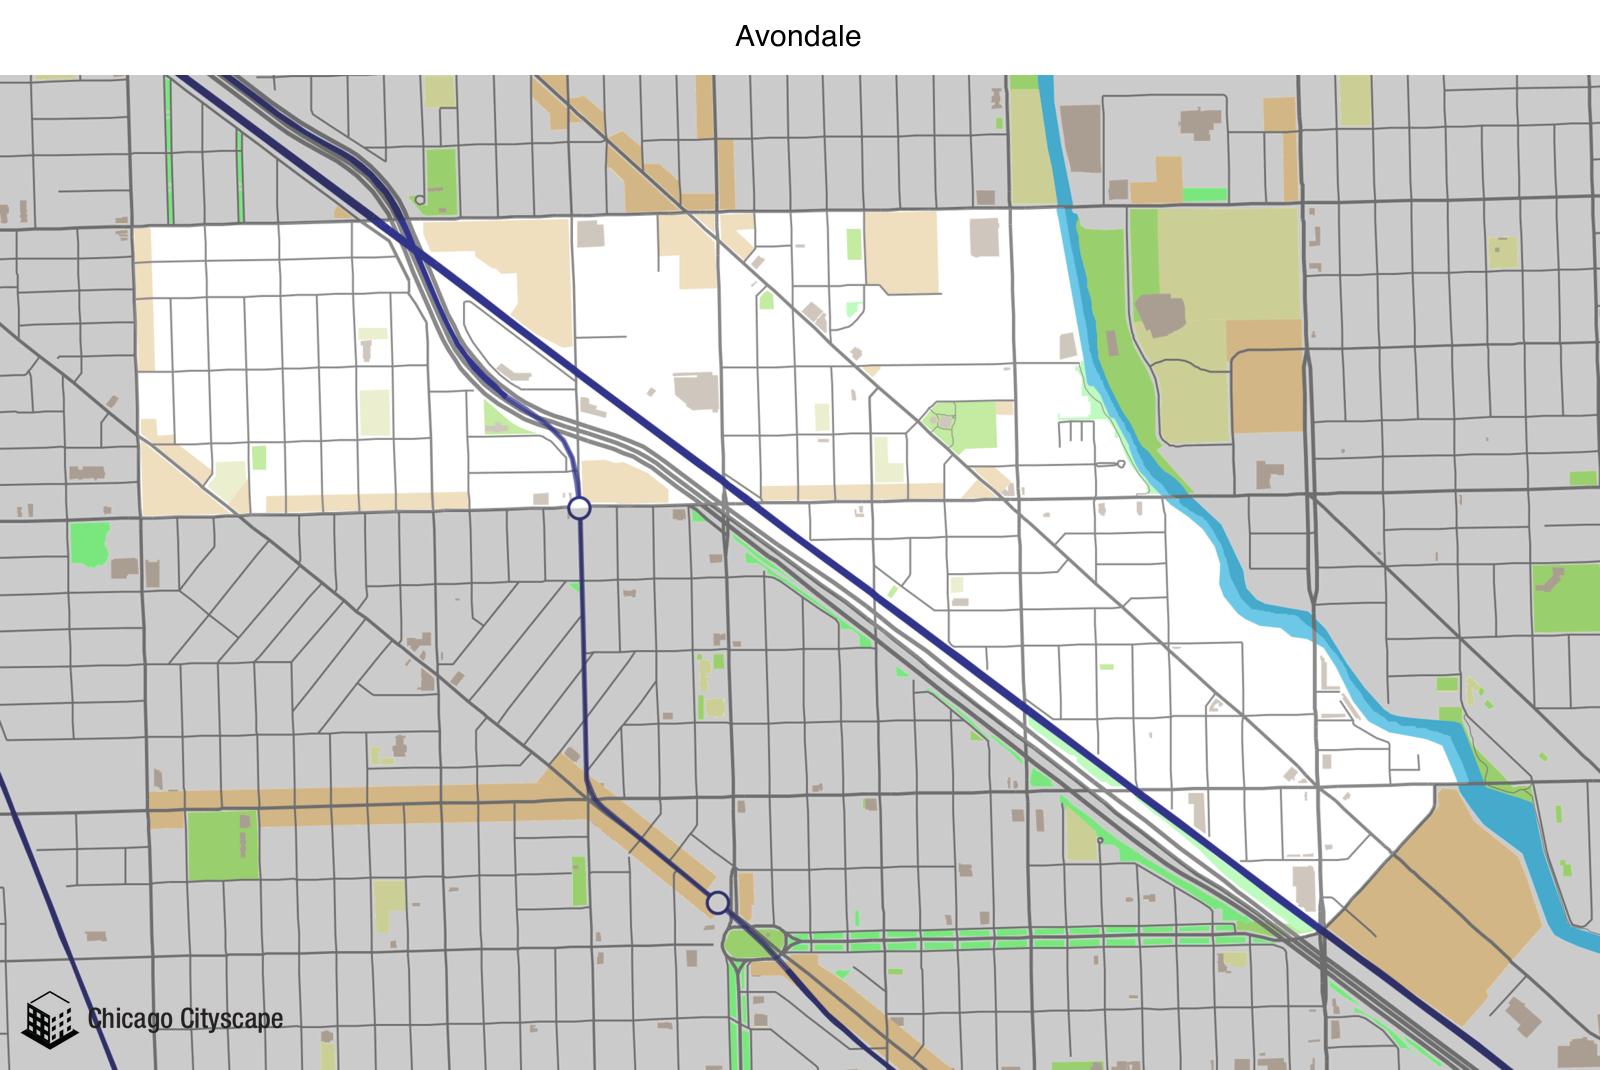 map of avondale neighborhood designed by chicago cityscape